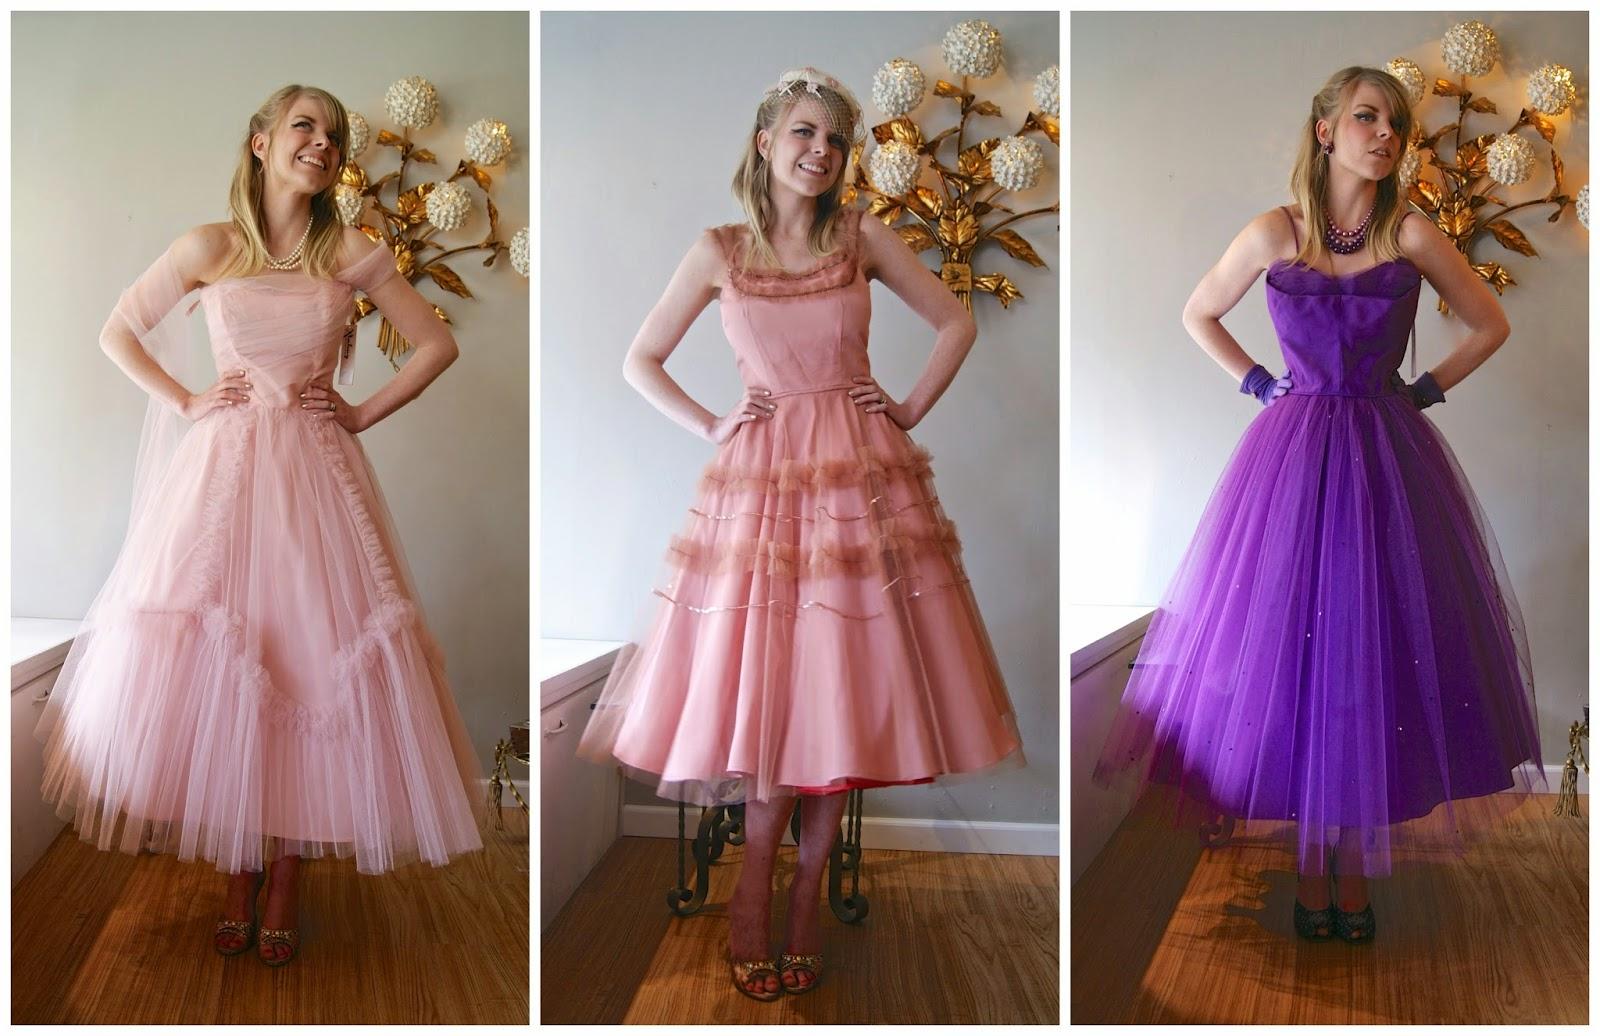 Xtabay Vintage Clothing Boutique - Portland, Oregon: Pretty in Prom ….